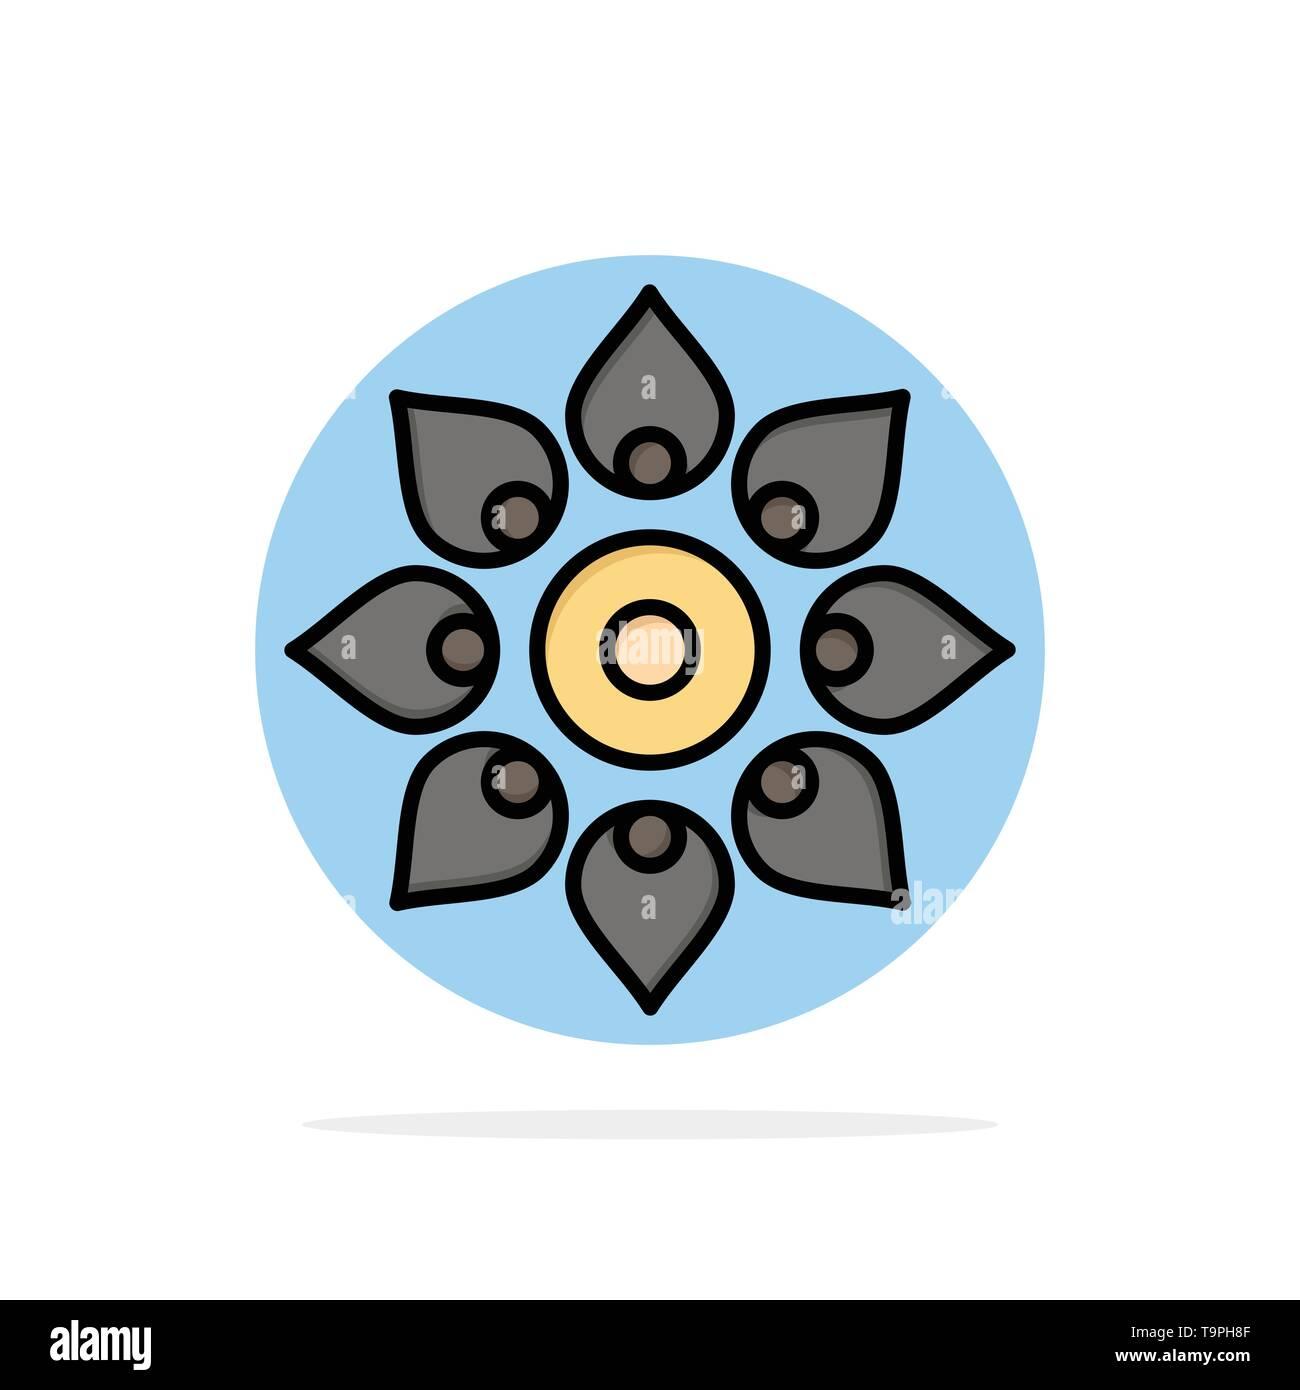 Celebrate, Decorate, Decoration, Diwali, Hindu, Holi Abstract Circle Background Flat color Icon - Stock Image